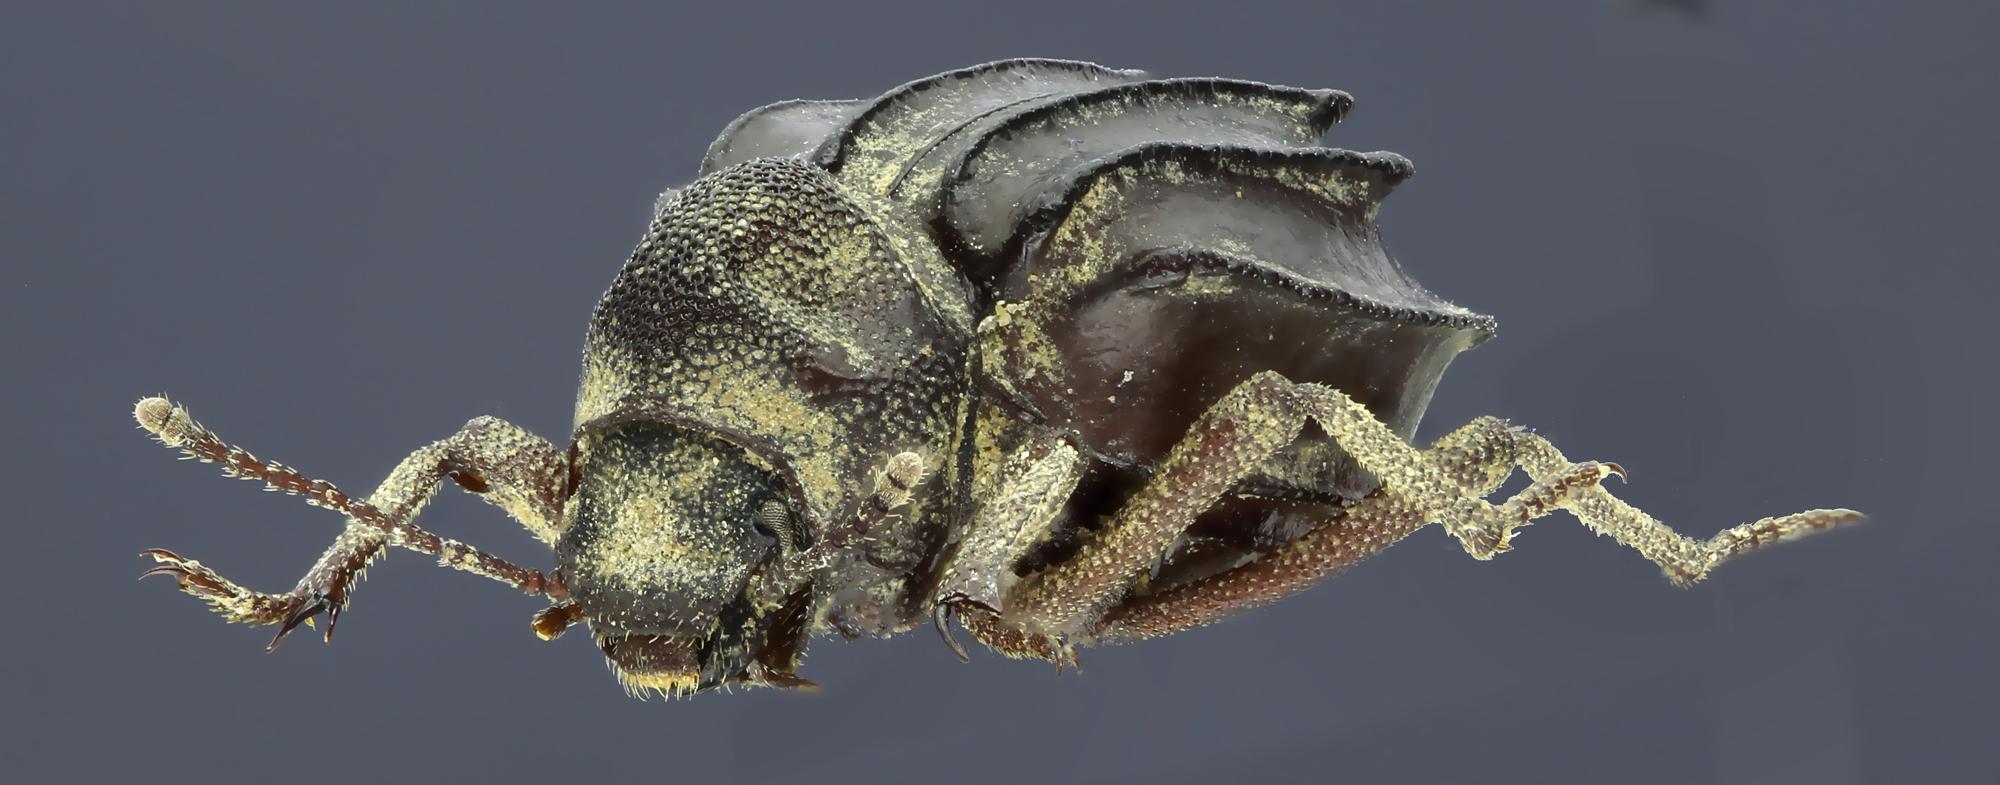 Euphrynus sexdentatus 35978zs16.jpg